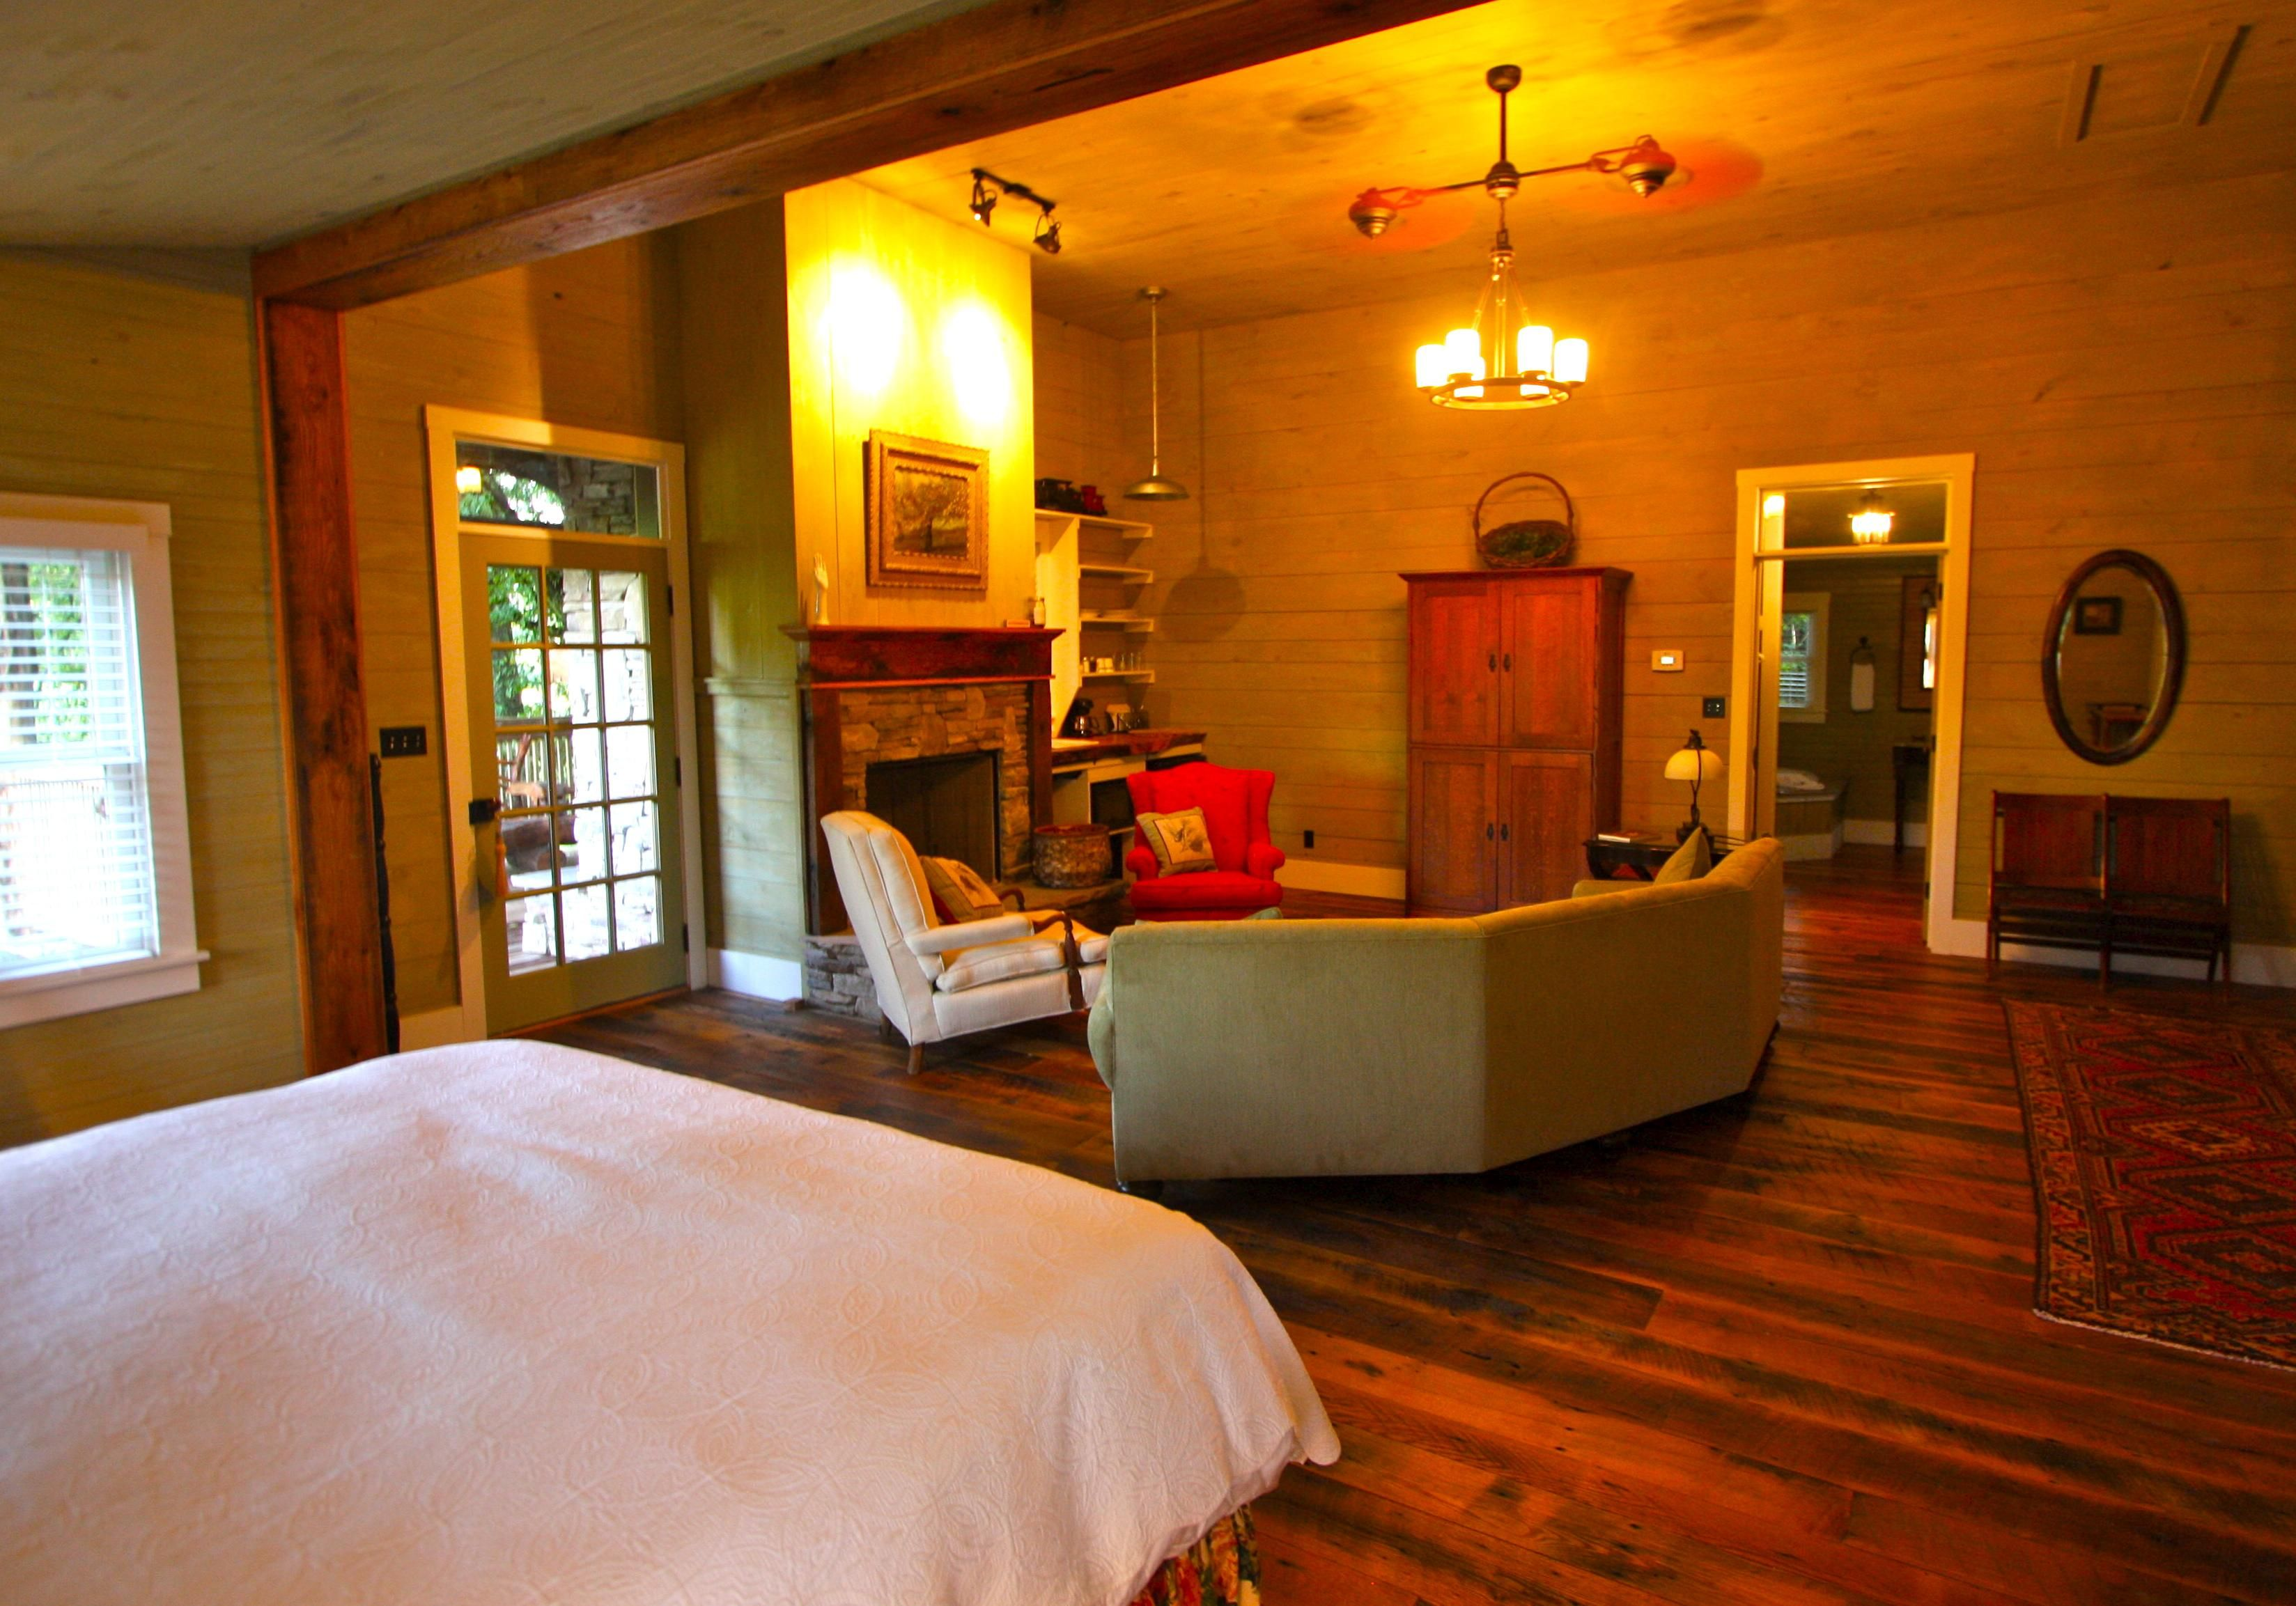 Hickory Cabin - The Farm Cabins   Cabin, Cozy cabin, Barn ...